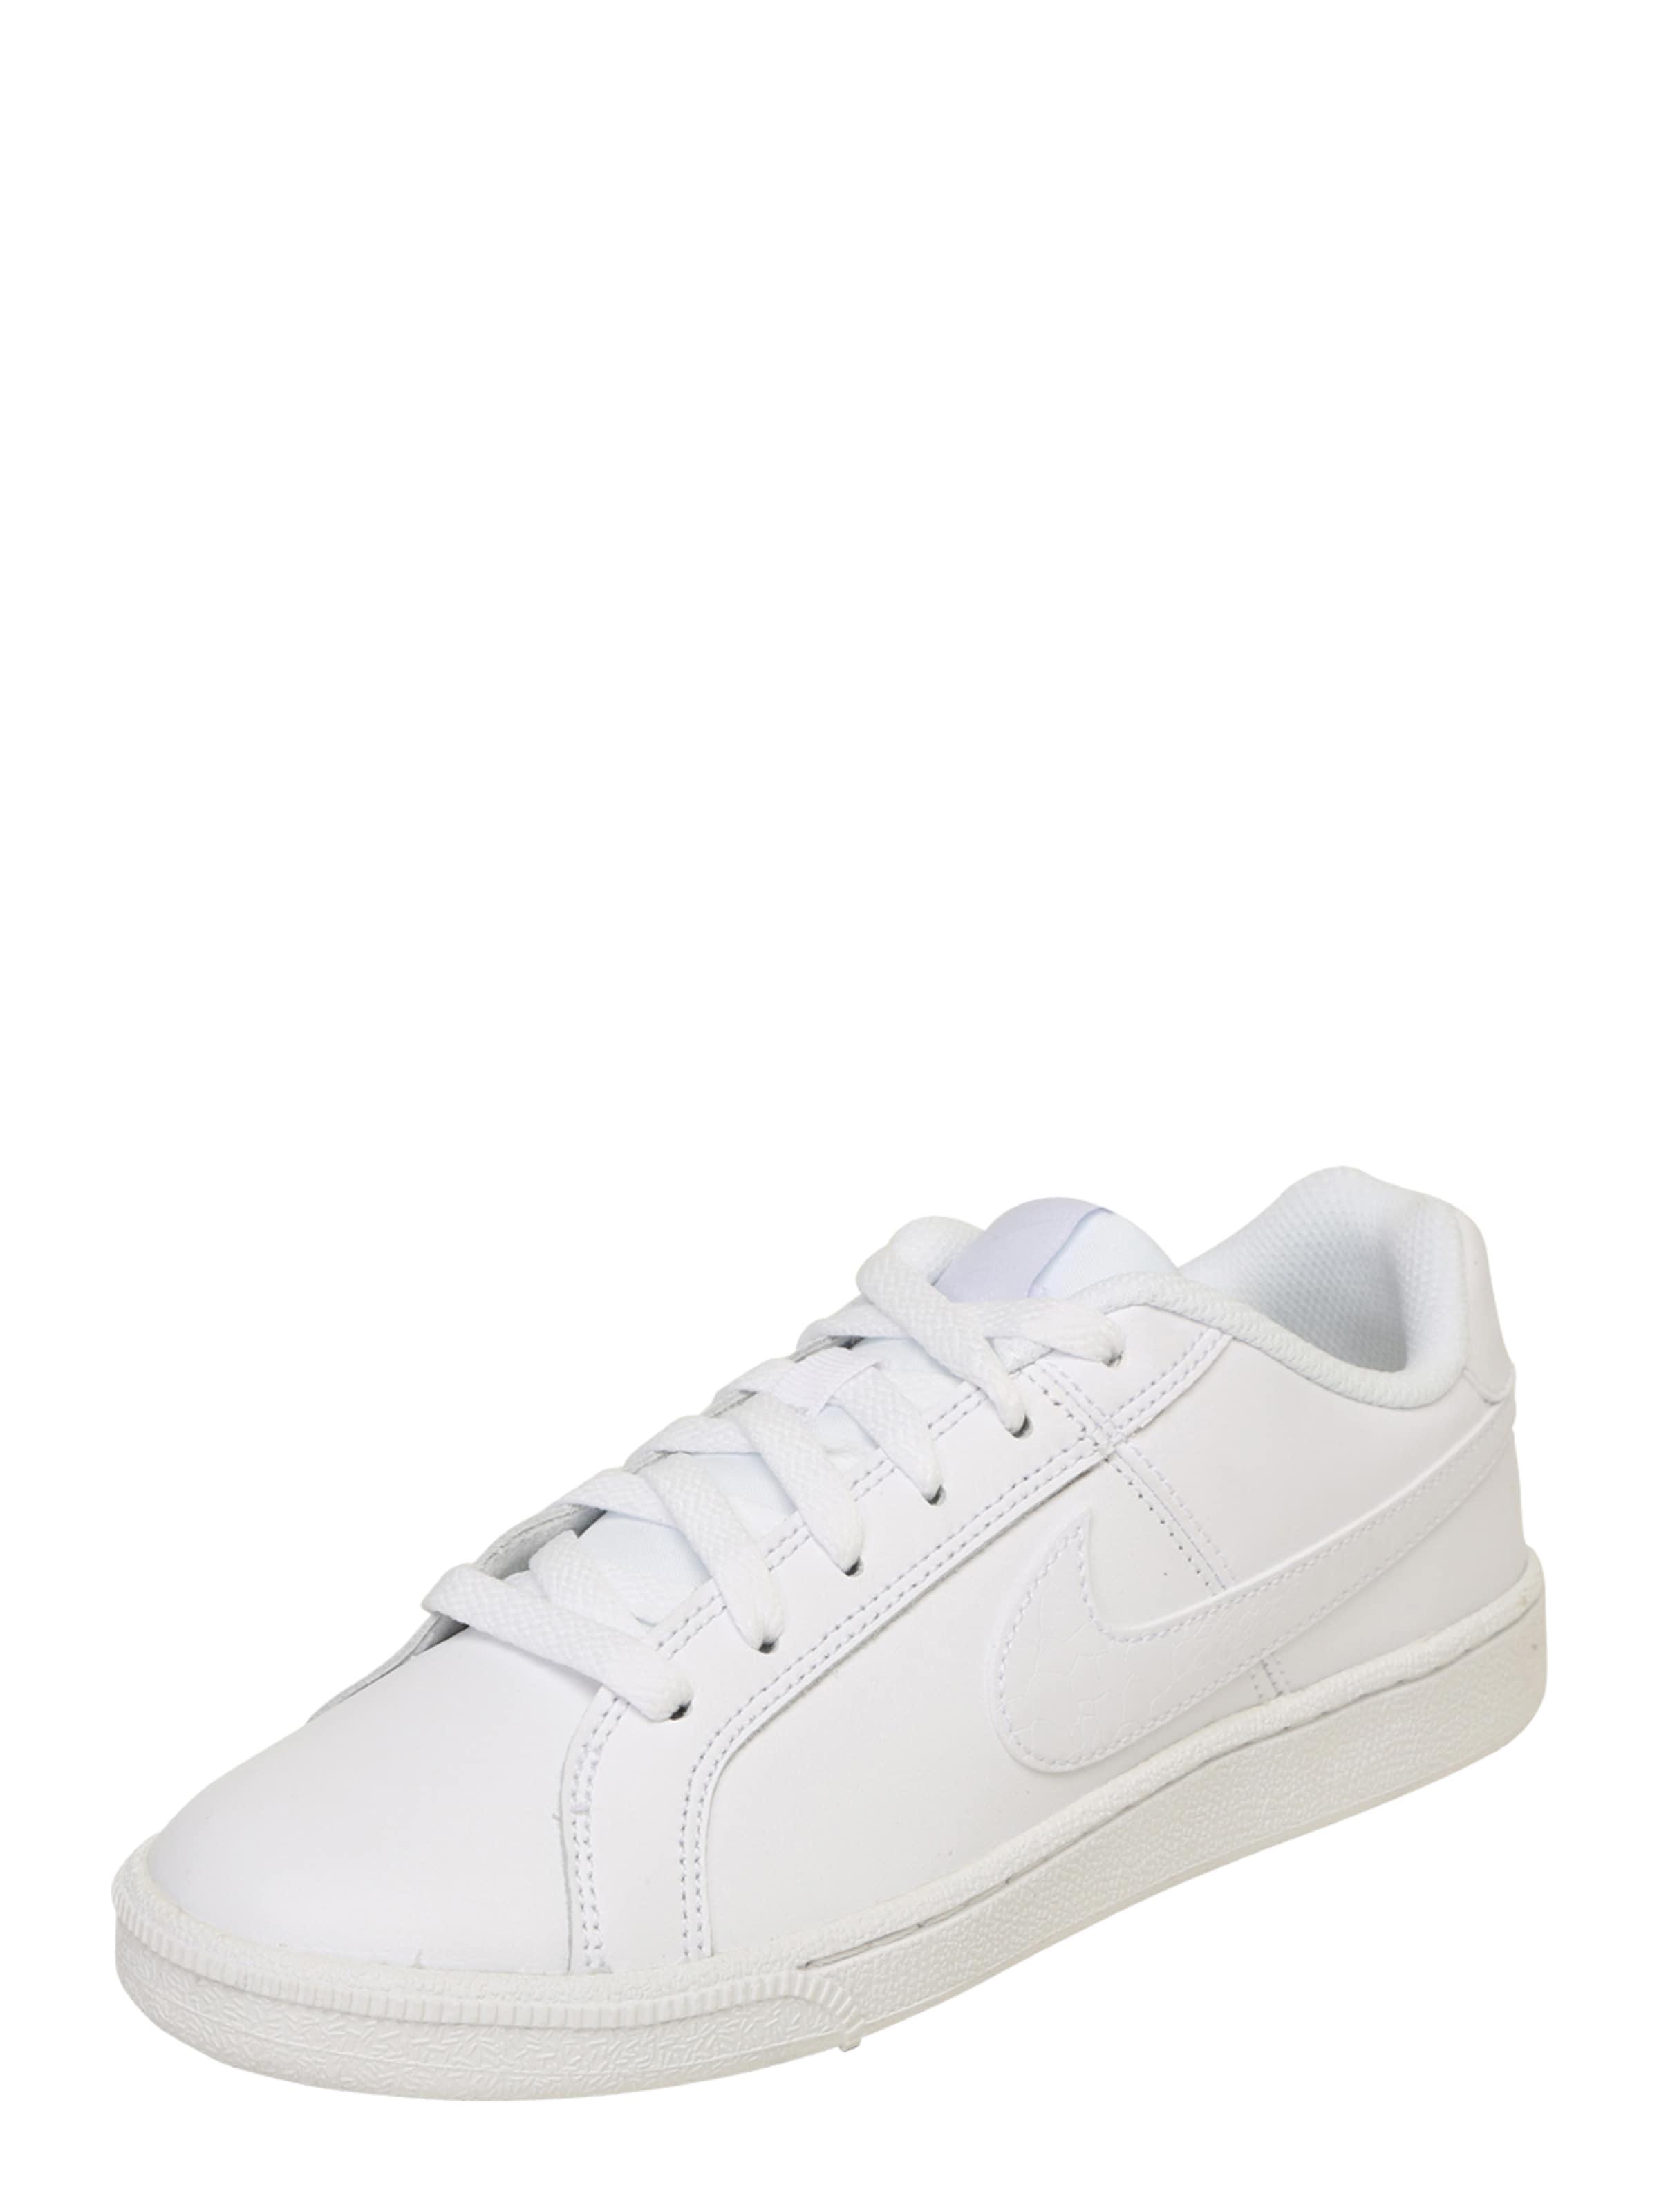 Nike Sportswear Sneaker Court Royale Hohe Qualität